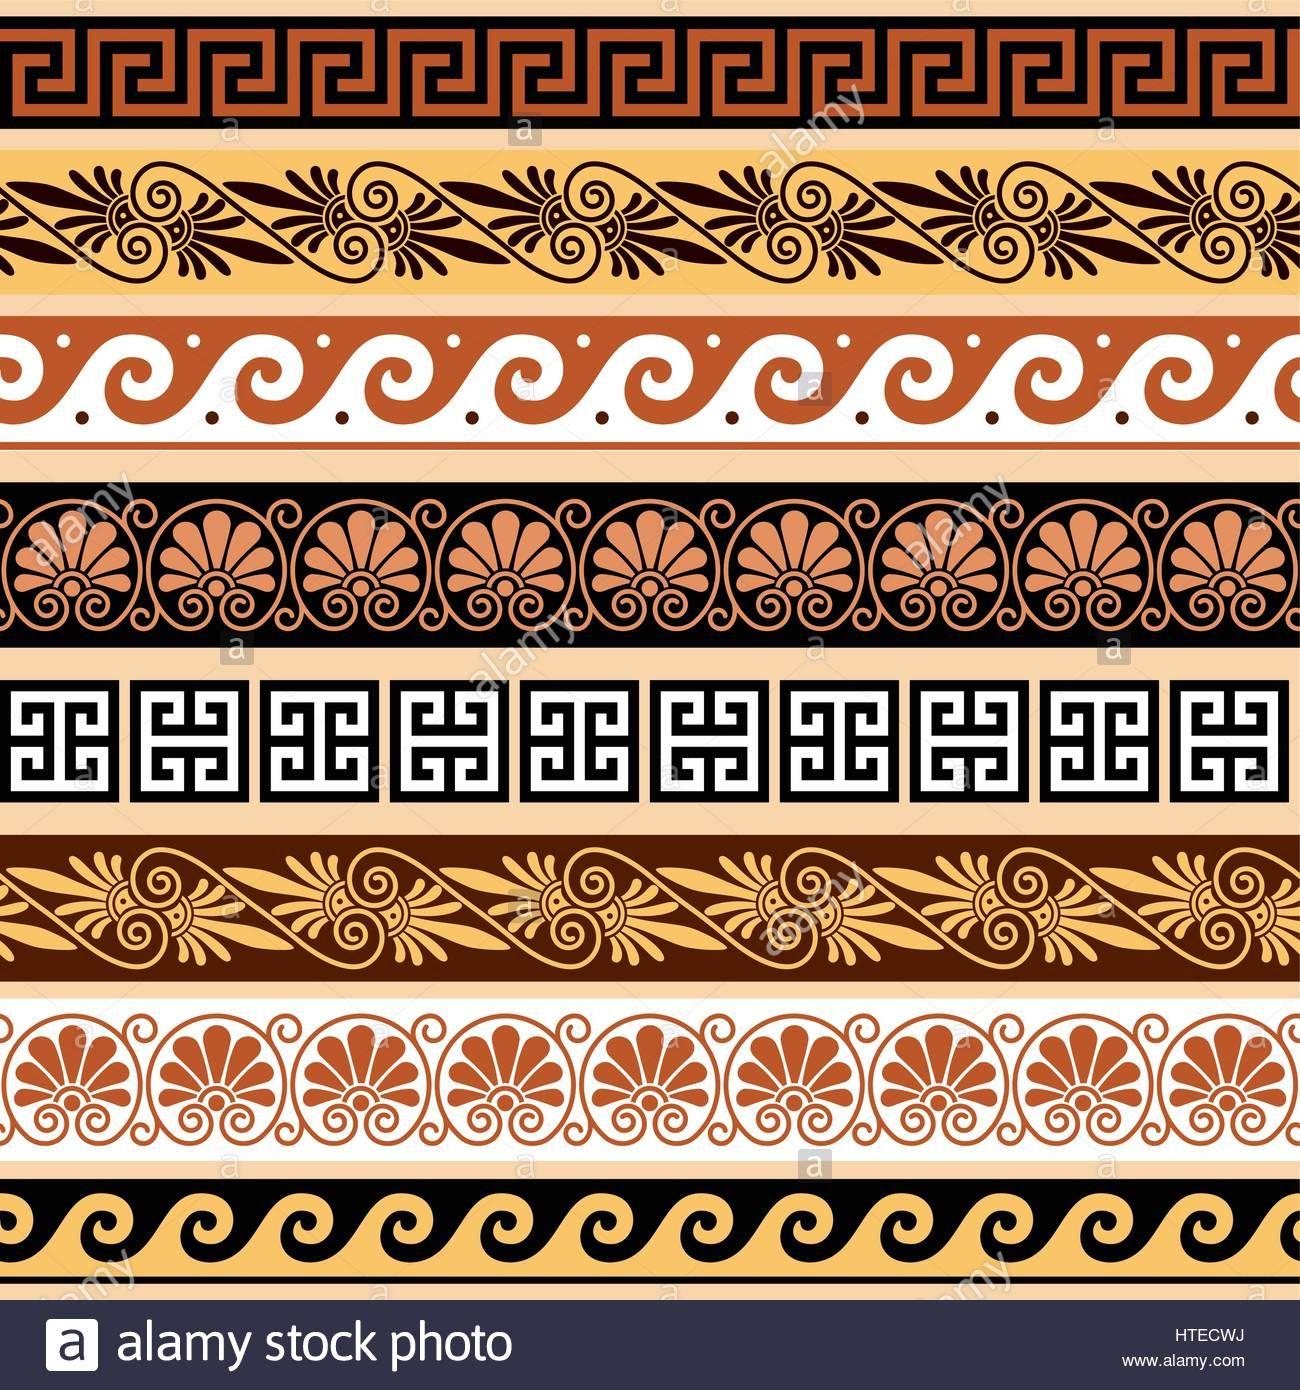 Http Www Alamy De Stockfoto Antike Griechische